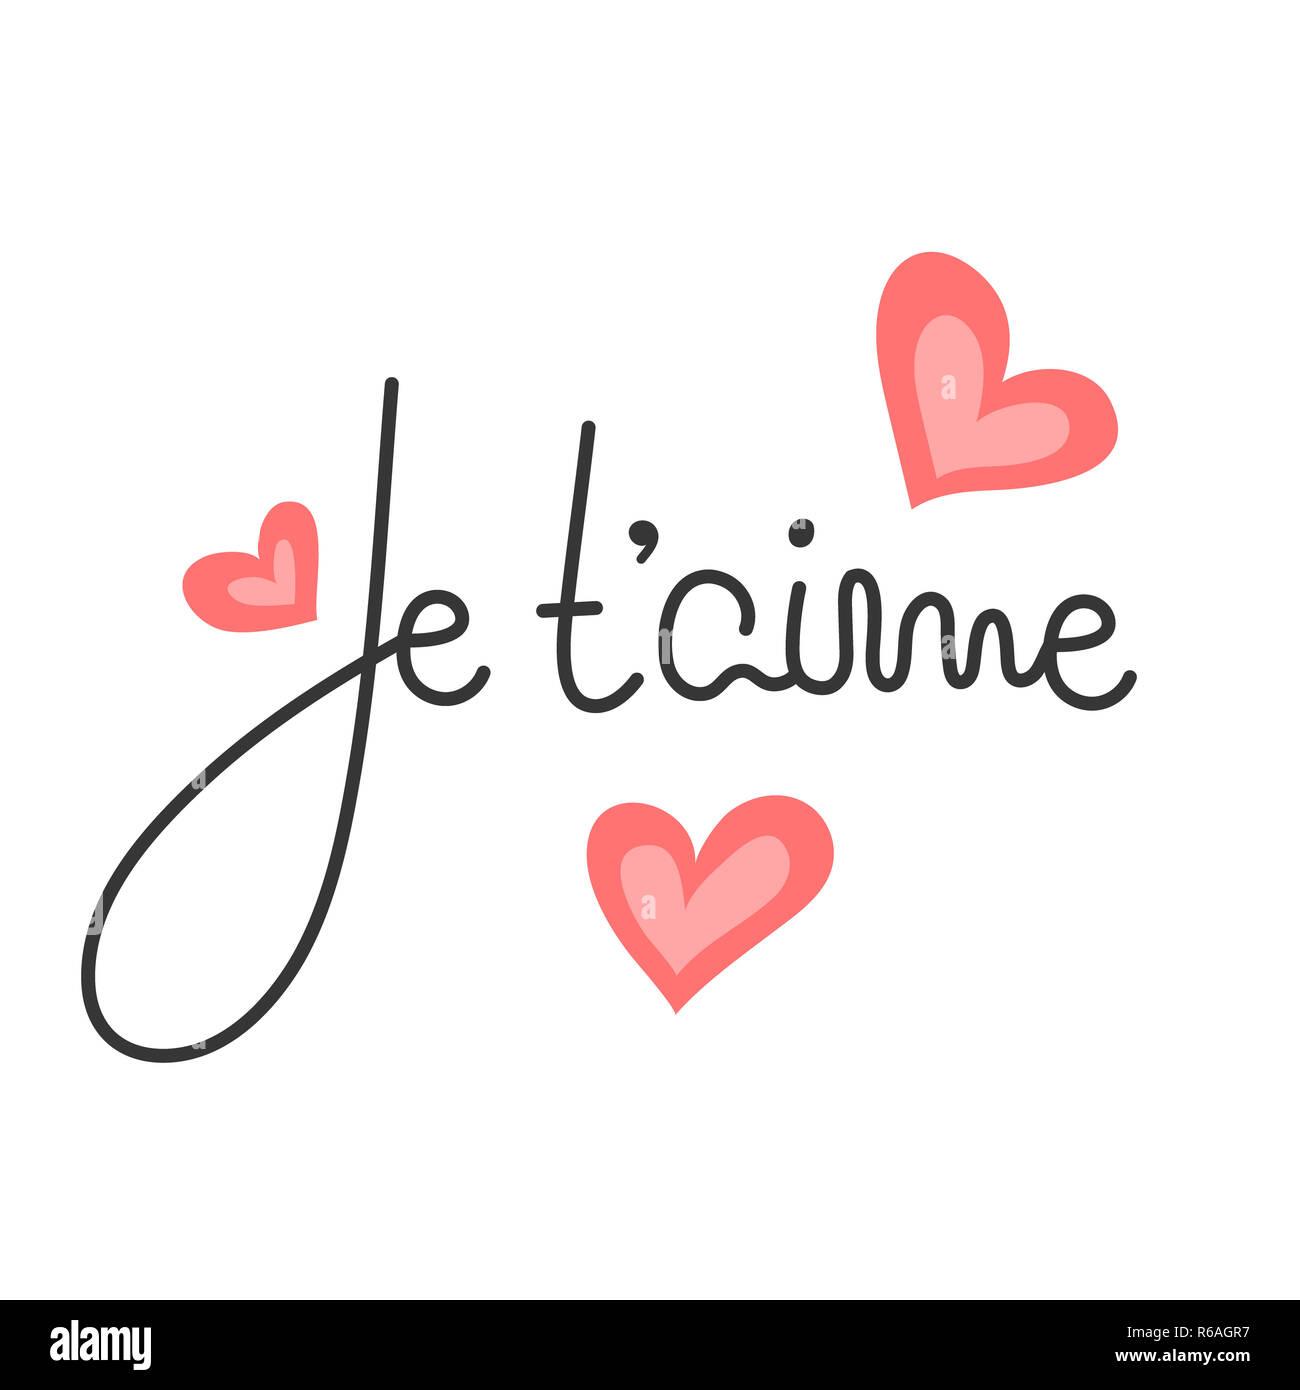 Je Taime Amour Imágenes De Stock Je Taime Amour Fotos De